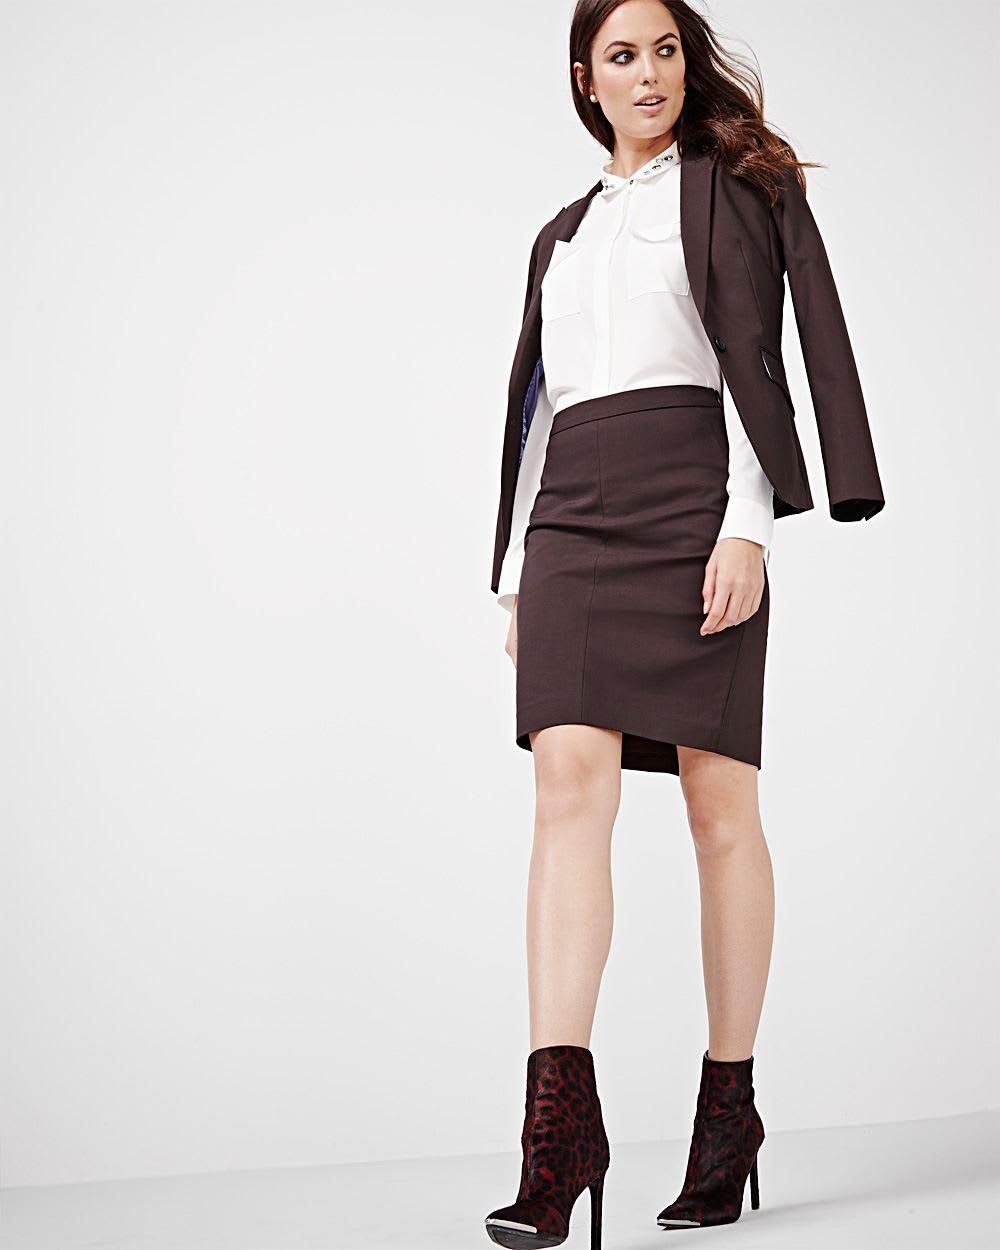 jupe droite en tissu moderne chic couleurs mode rw co. Black Bedroom Furniture Sets. Home Design Ideas